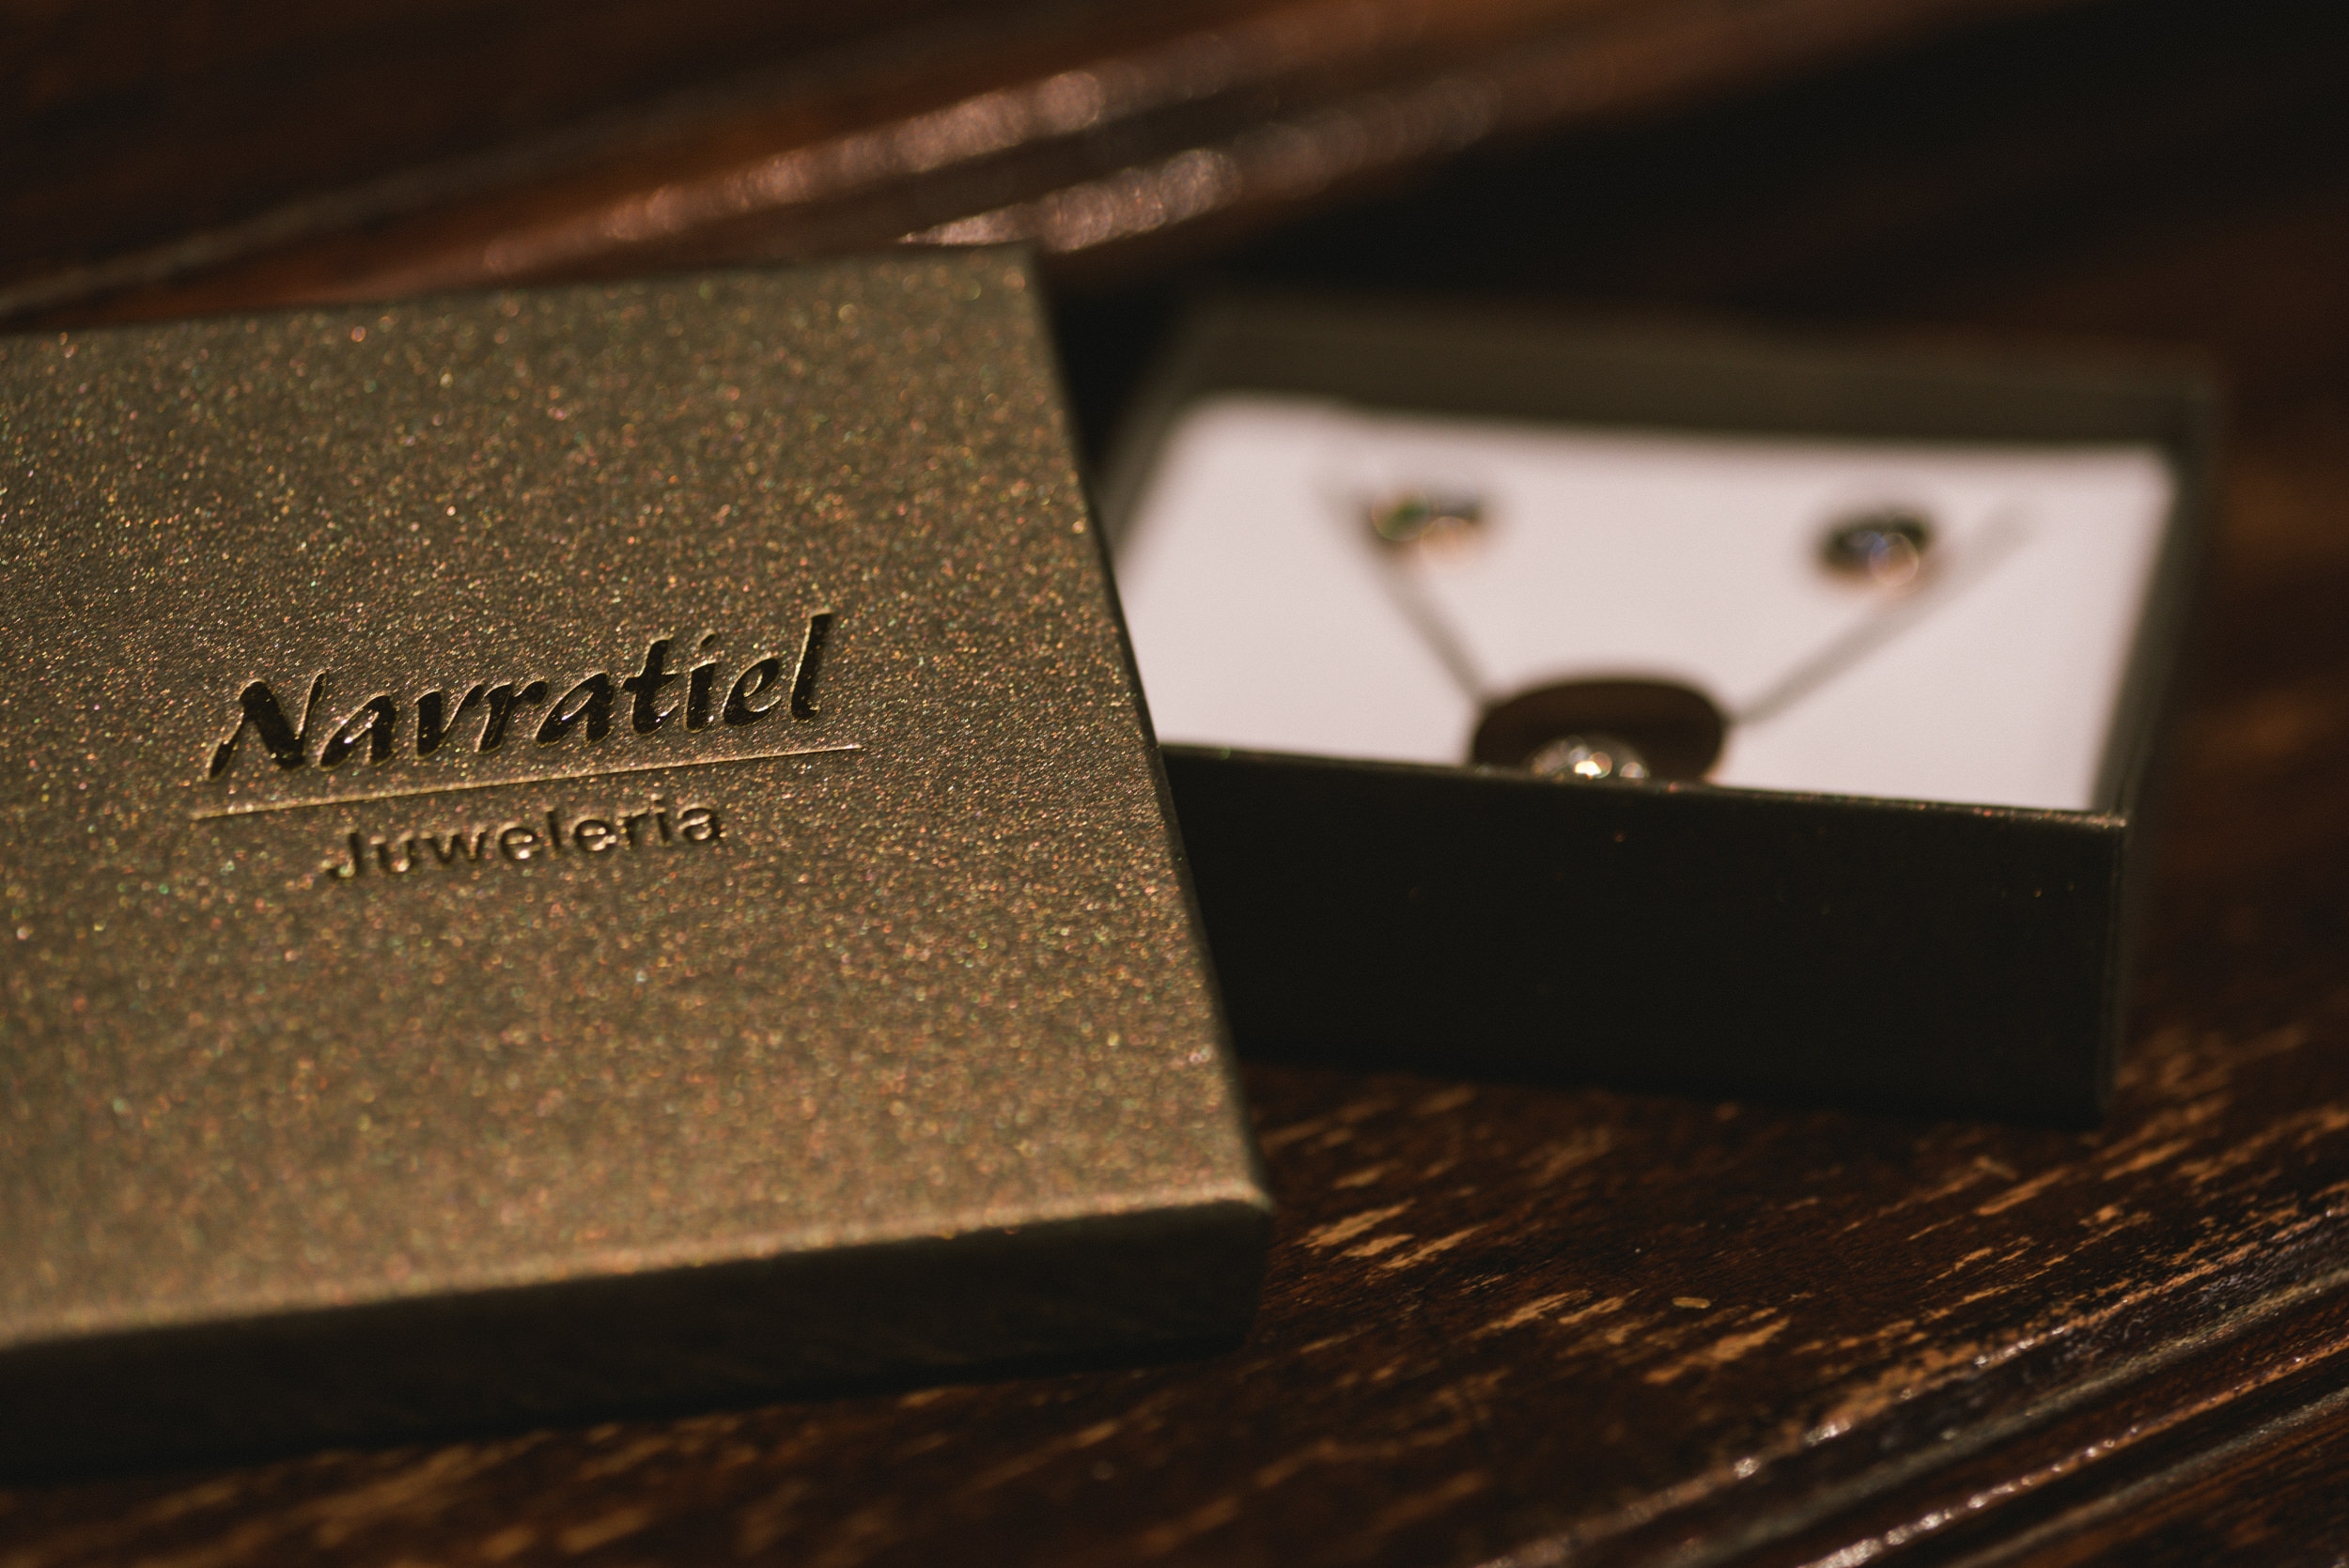 Juweleria_Navratiel_2018_WEB-030